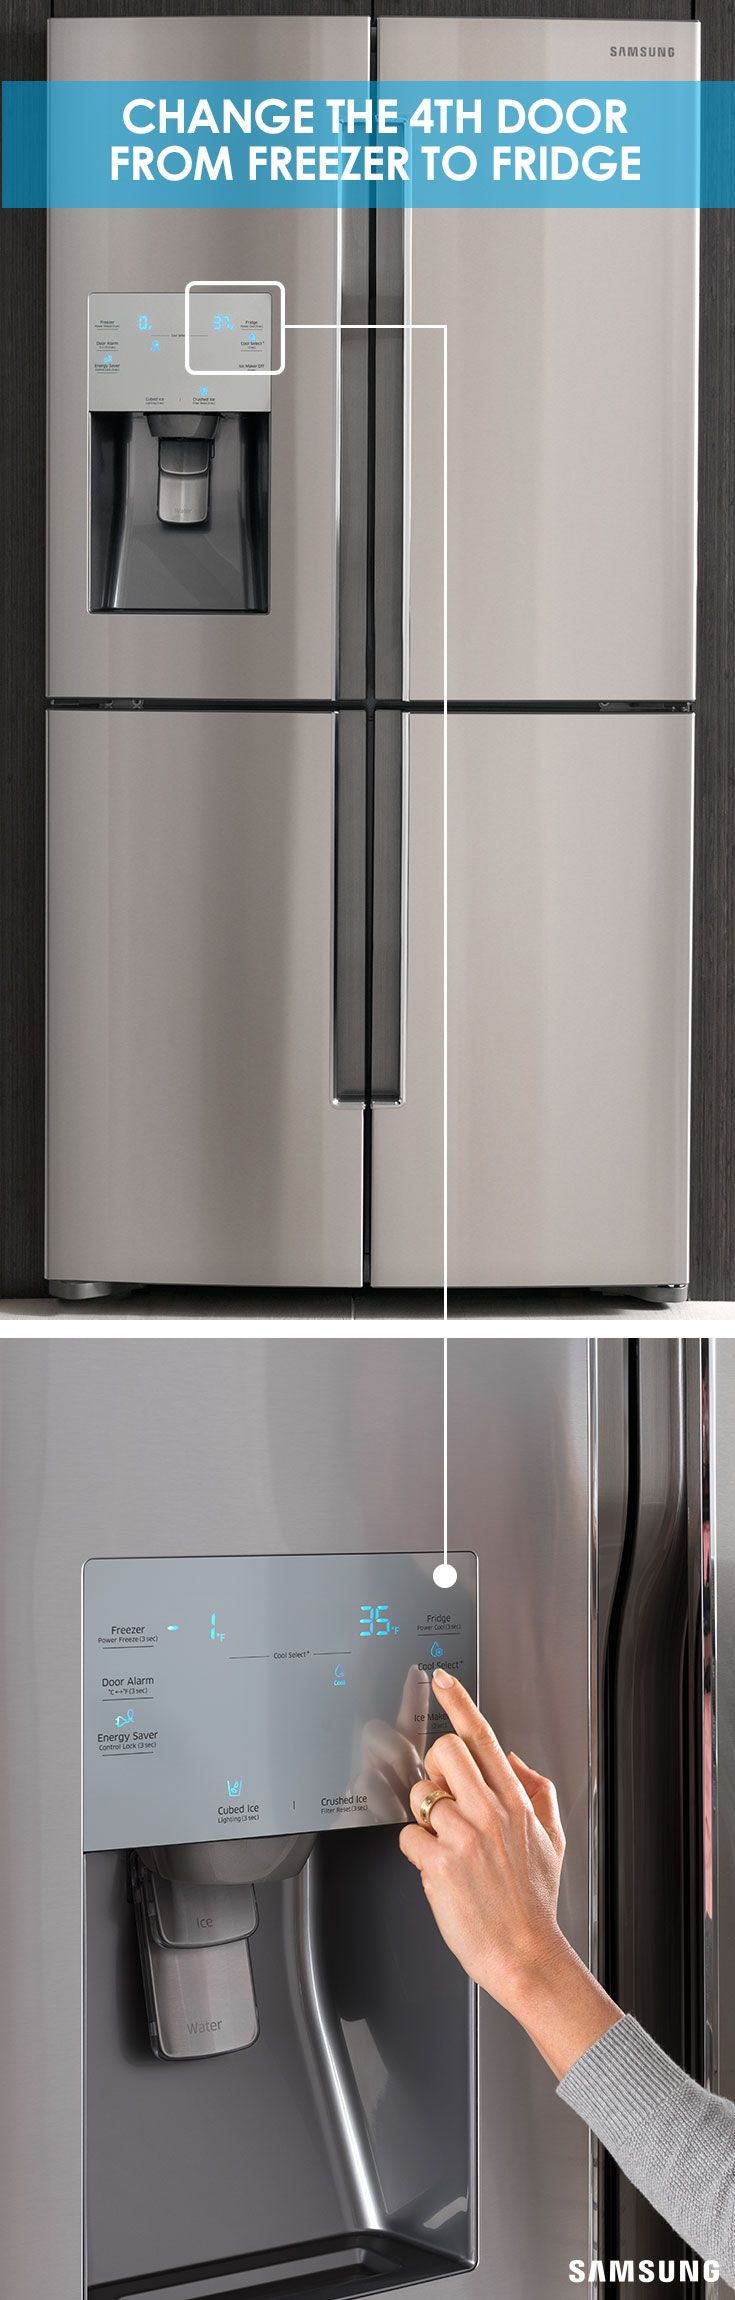 how to reset samsung refrigerator temperature